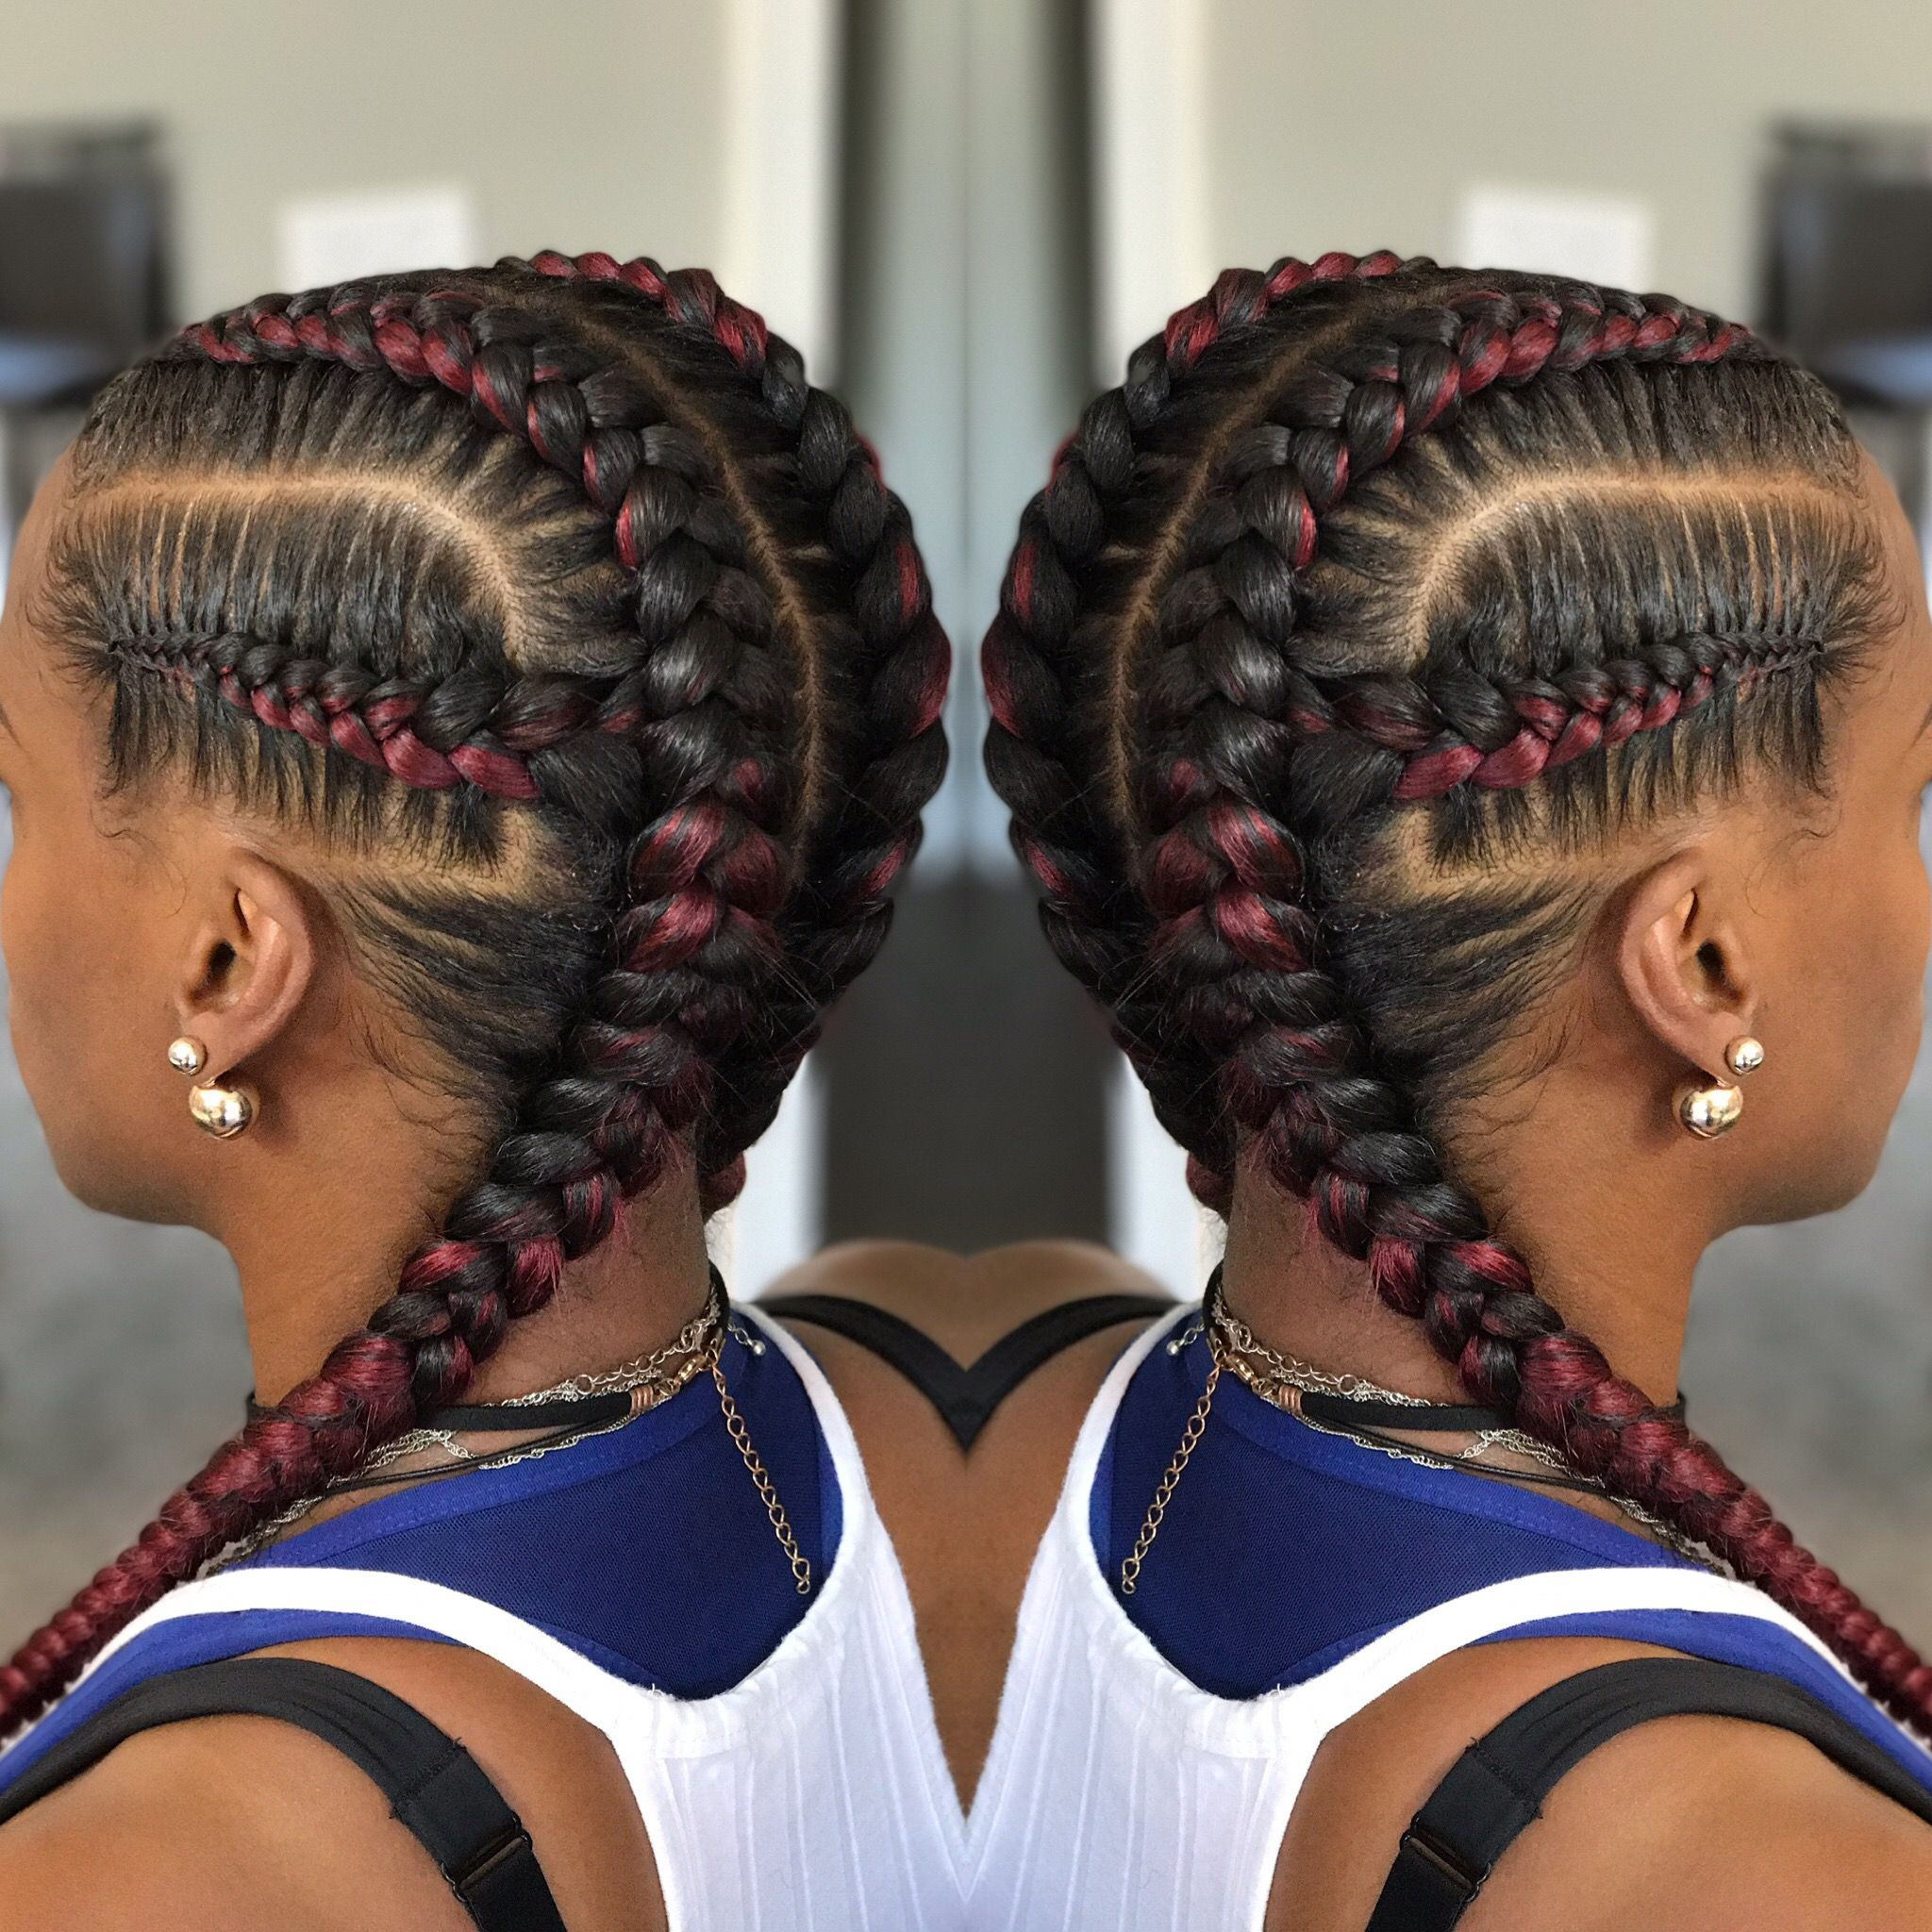 Phoenix Tempe Hairstylist Book Online Www Marmarzdivinestylez Com 520 371 3100 5151 E Cornrow Hairstyles African Braids Hairstyles Braided Hairstyles